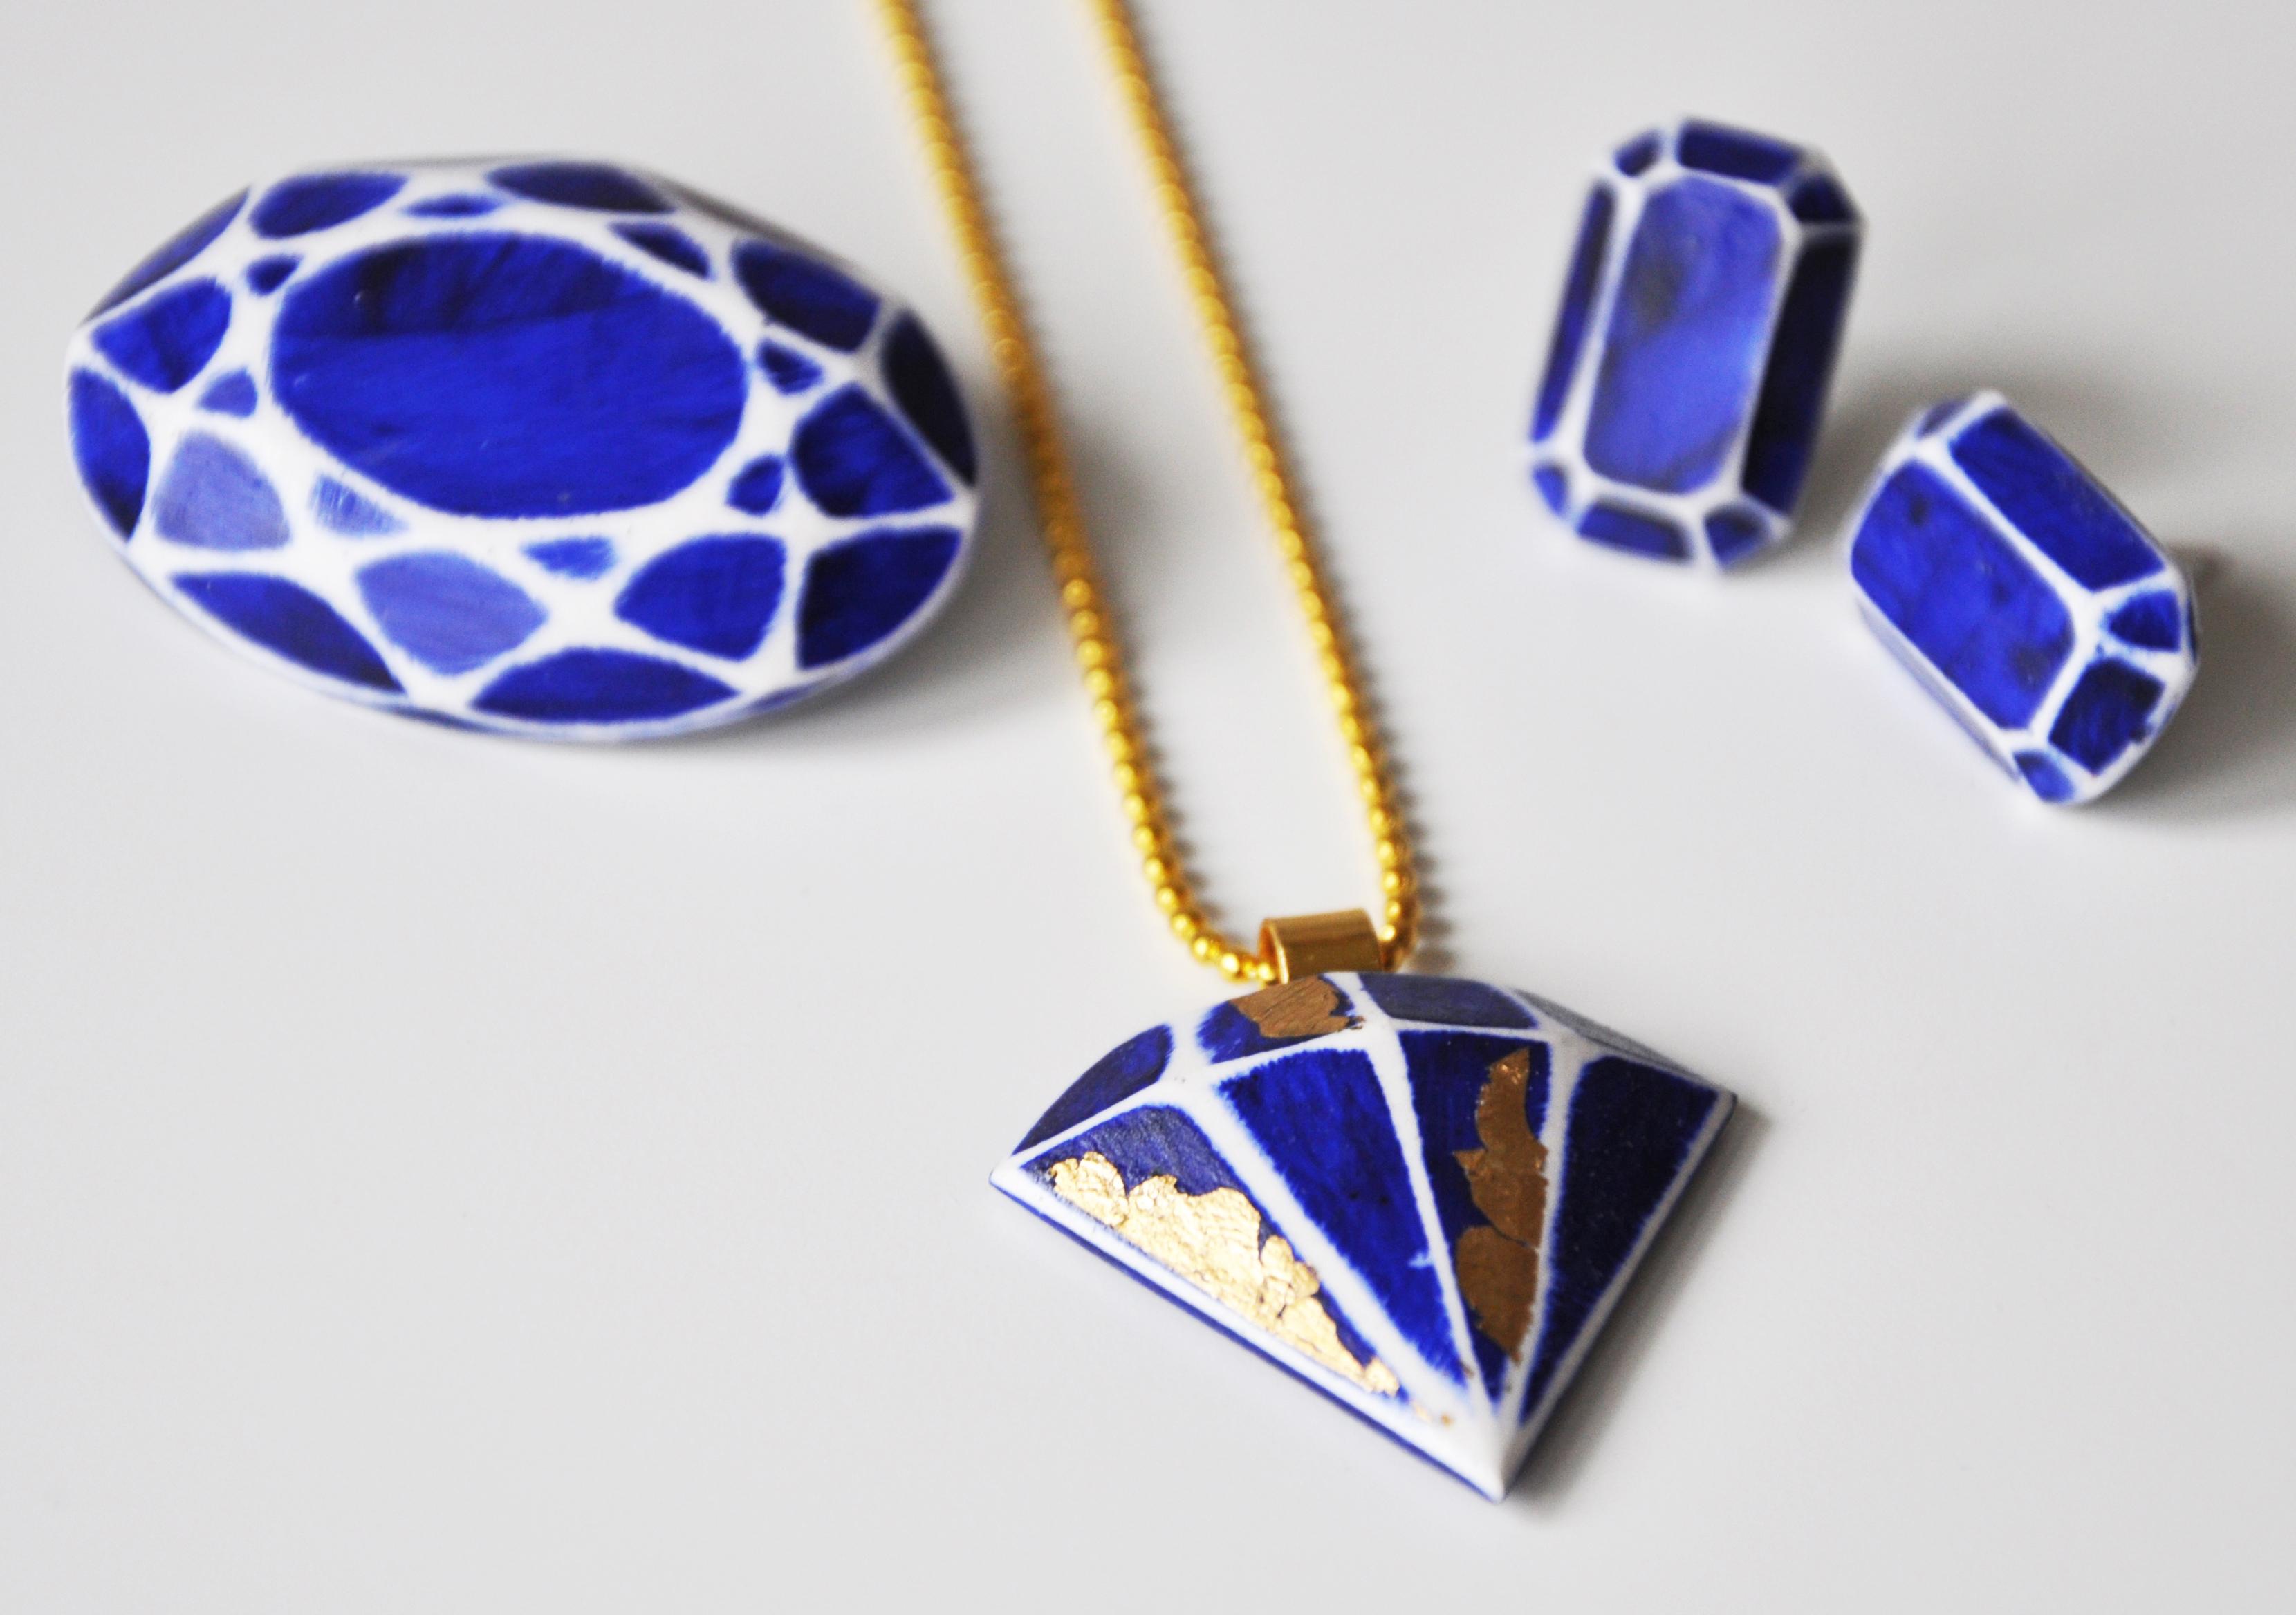 Constellation range cast stone plaster brooch, gem studs and gem pendant with 24ct gold leaf